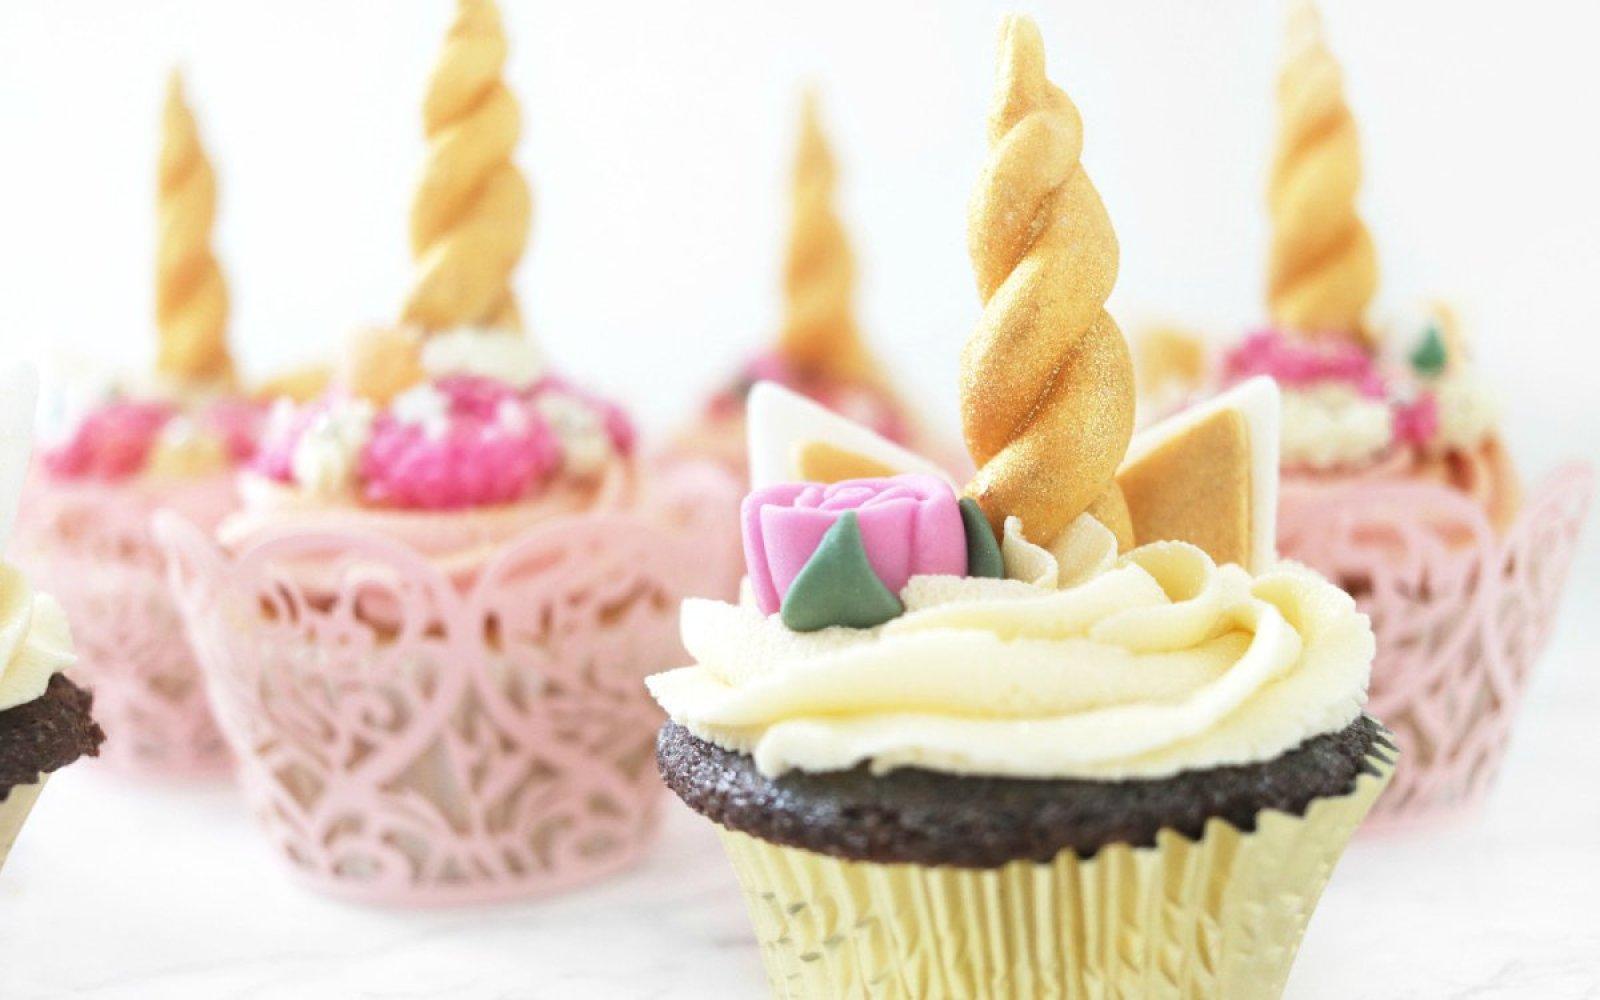 Vegan Gluten-Free Unicorn Chocolate Cupcakes With Unicorn Horn